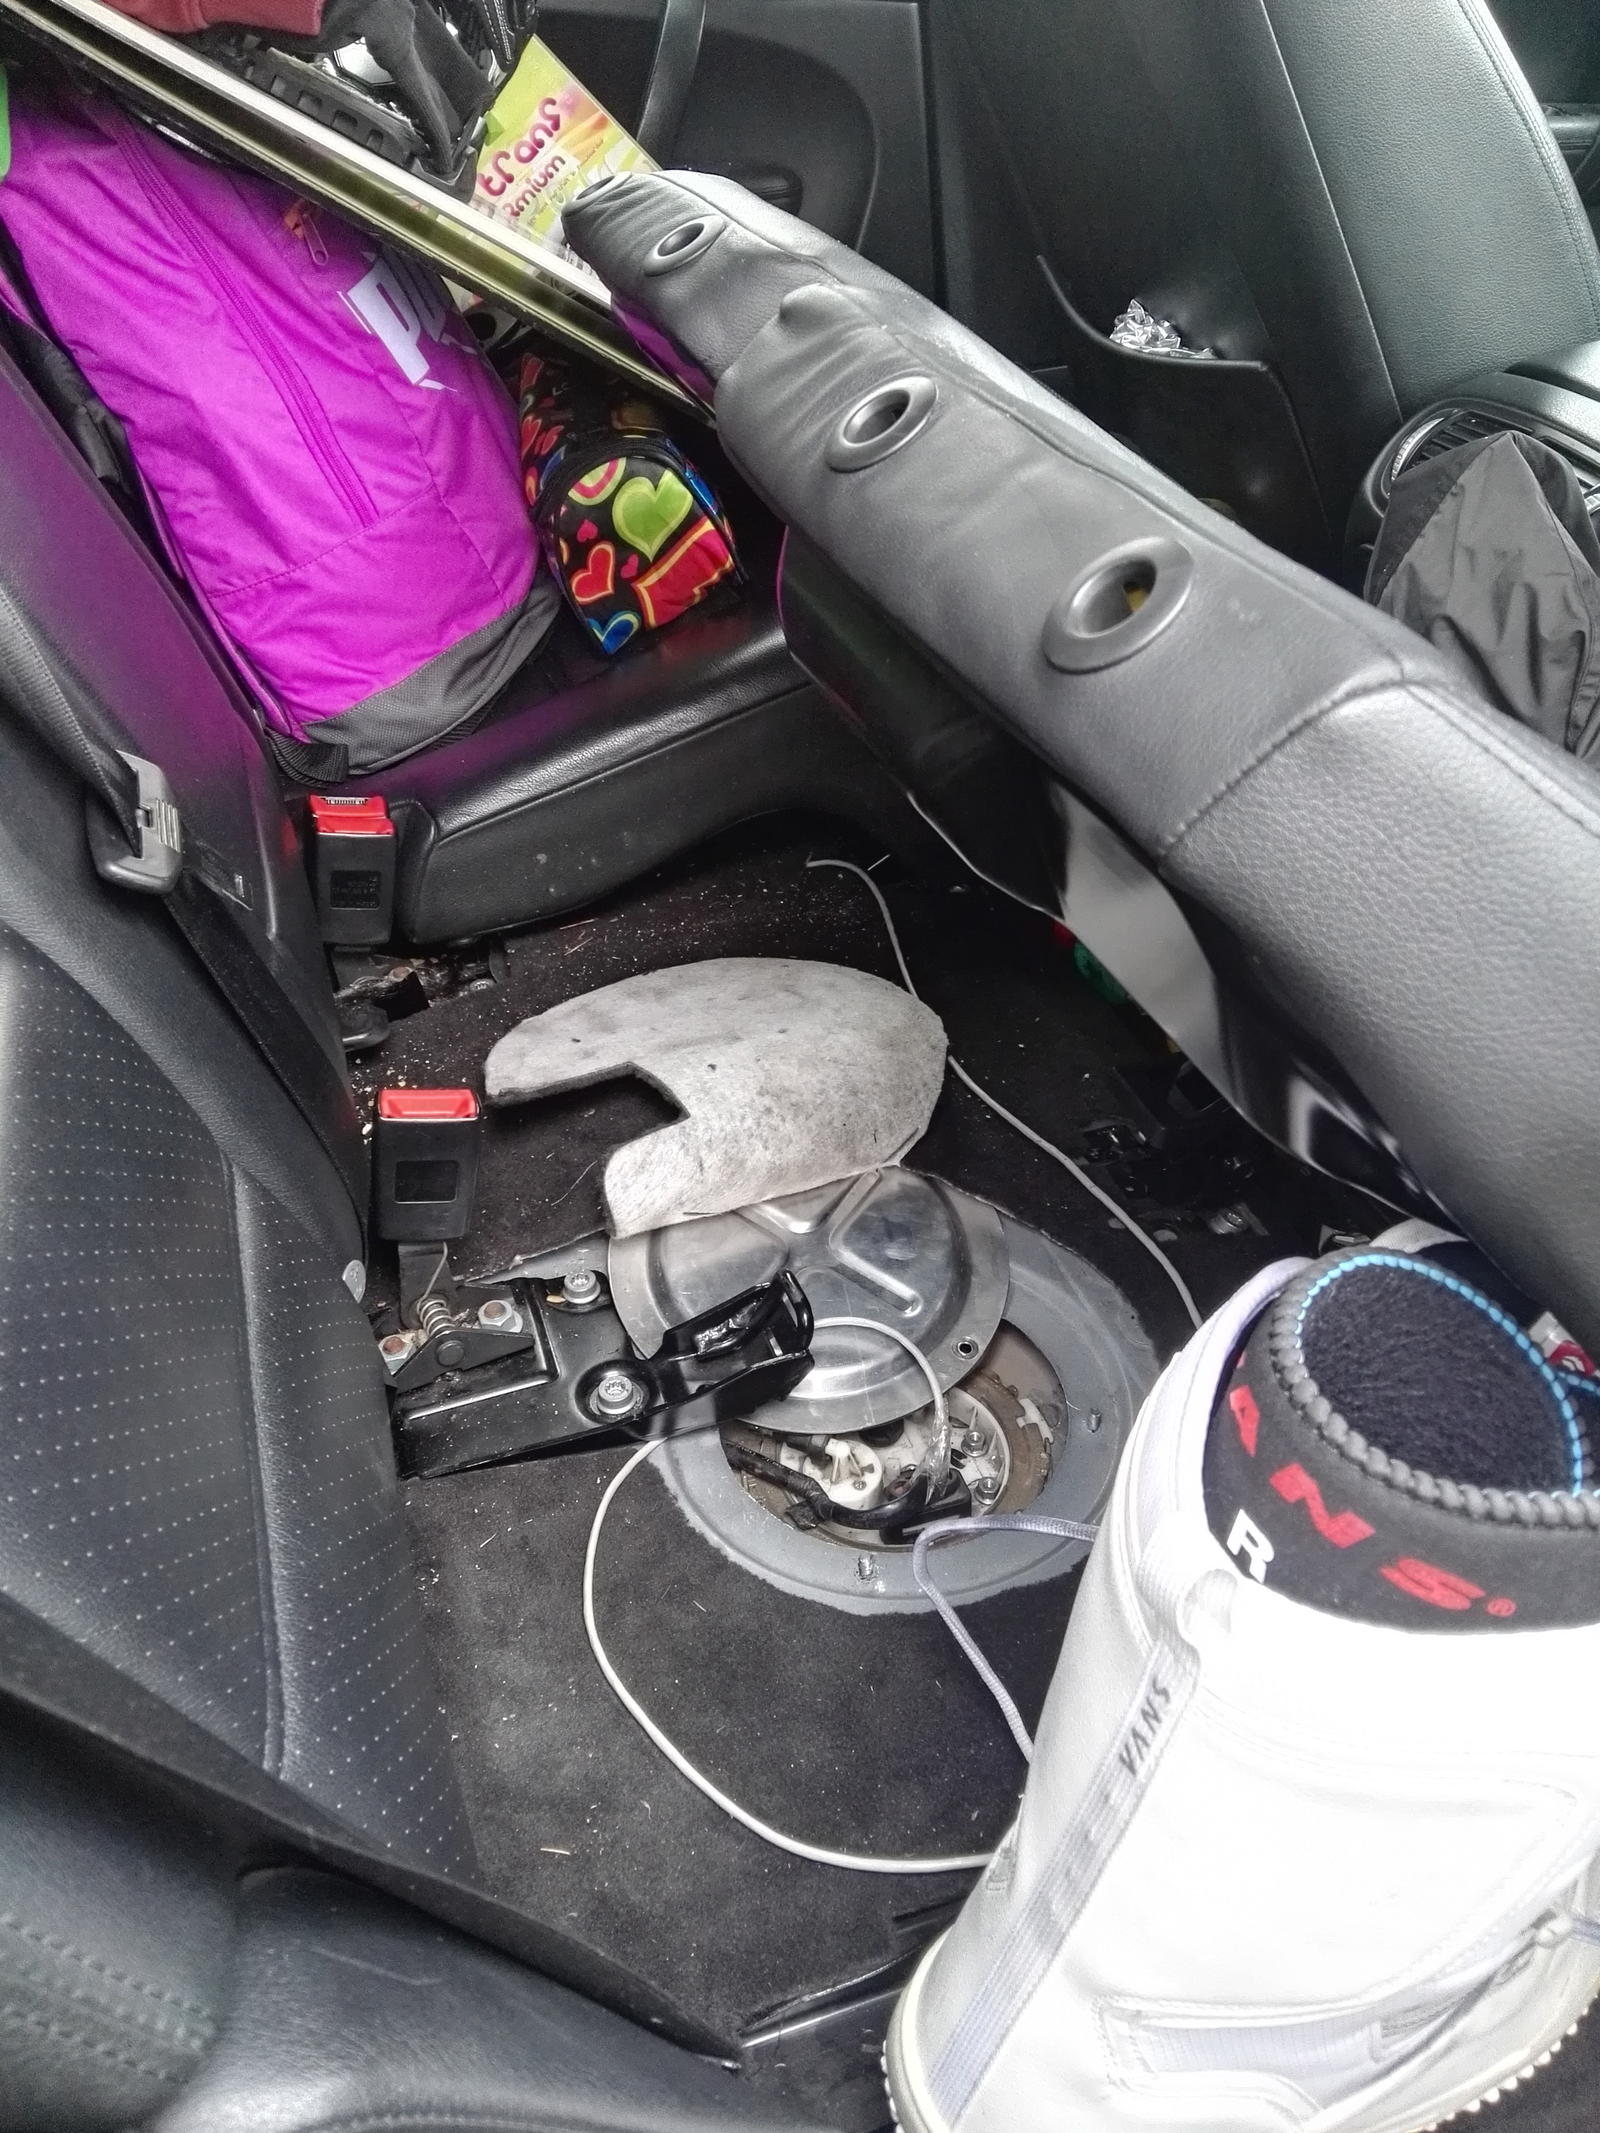 hight resolution of cayenne fuse box location honda nighthawk cb750 wiring diagram 04 cayenne fuel filter and pump replacement rennlist porsche 1126205d1484565806 04 cayenne